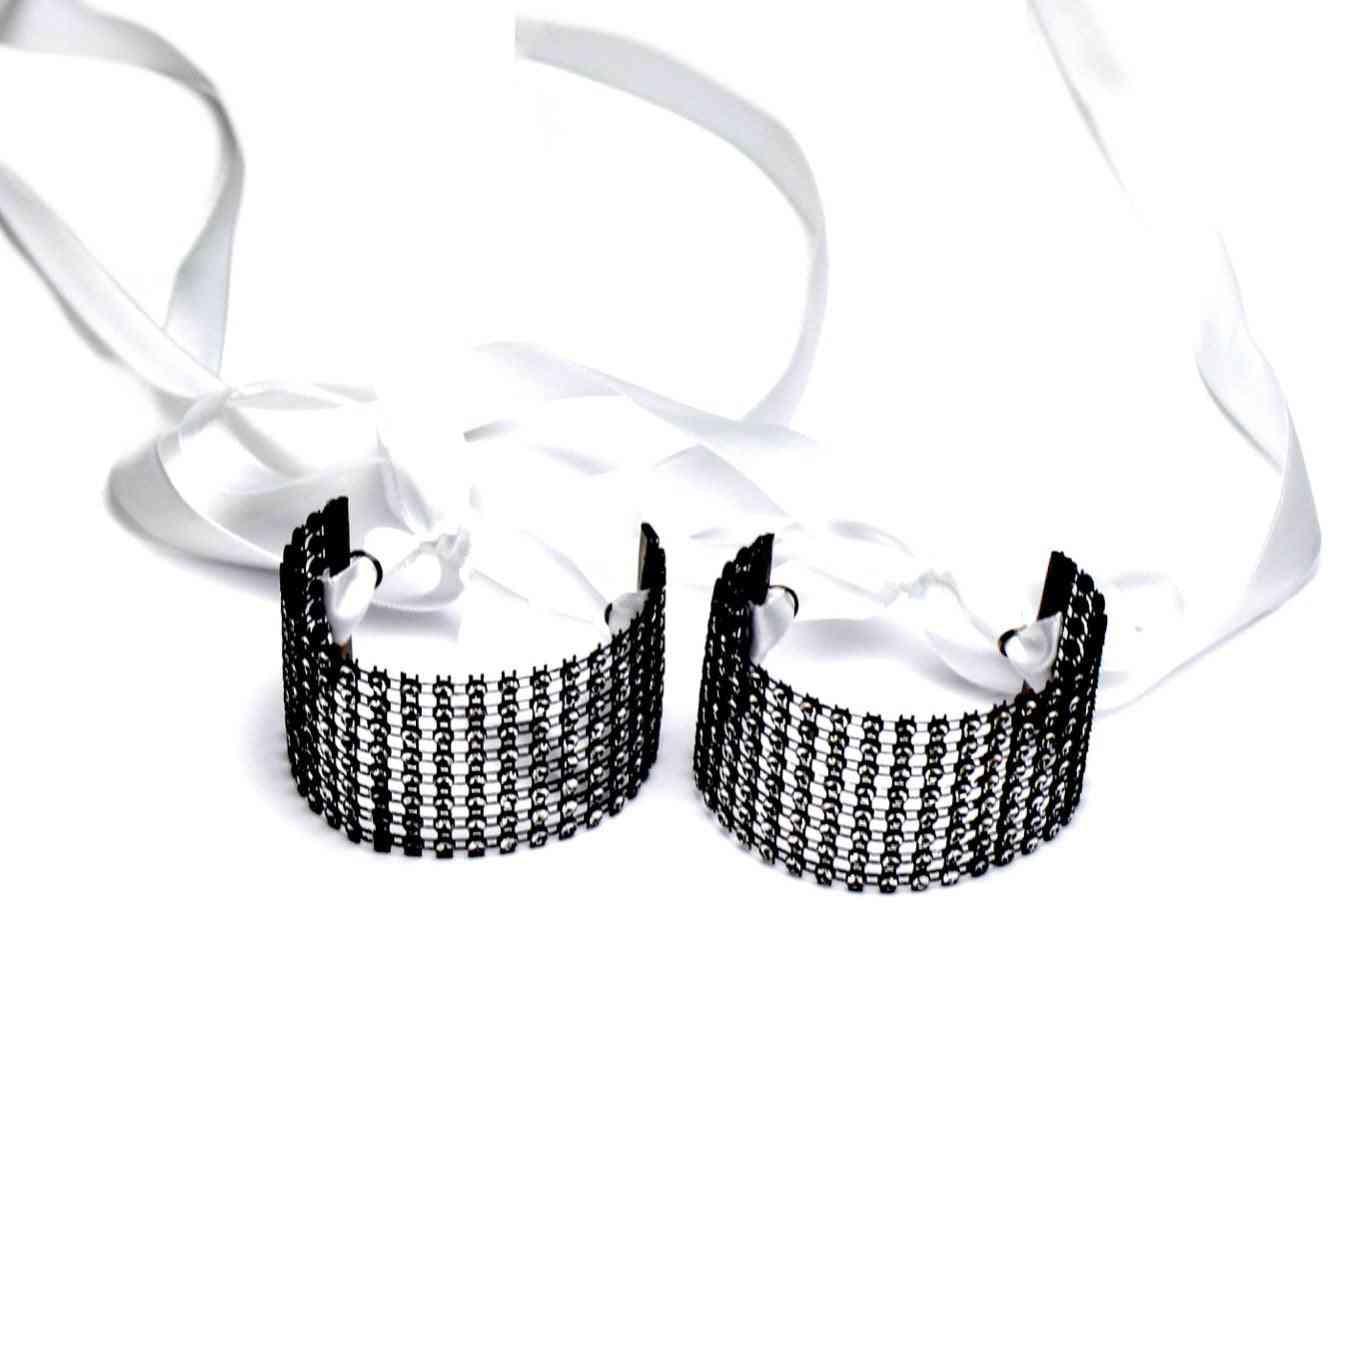 Sparkly Rhinestone Mesh Handcuffs